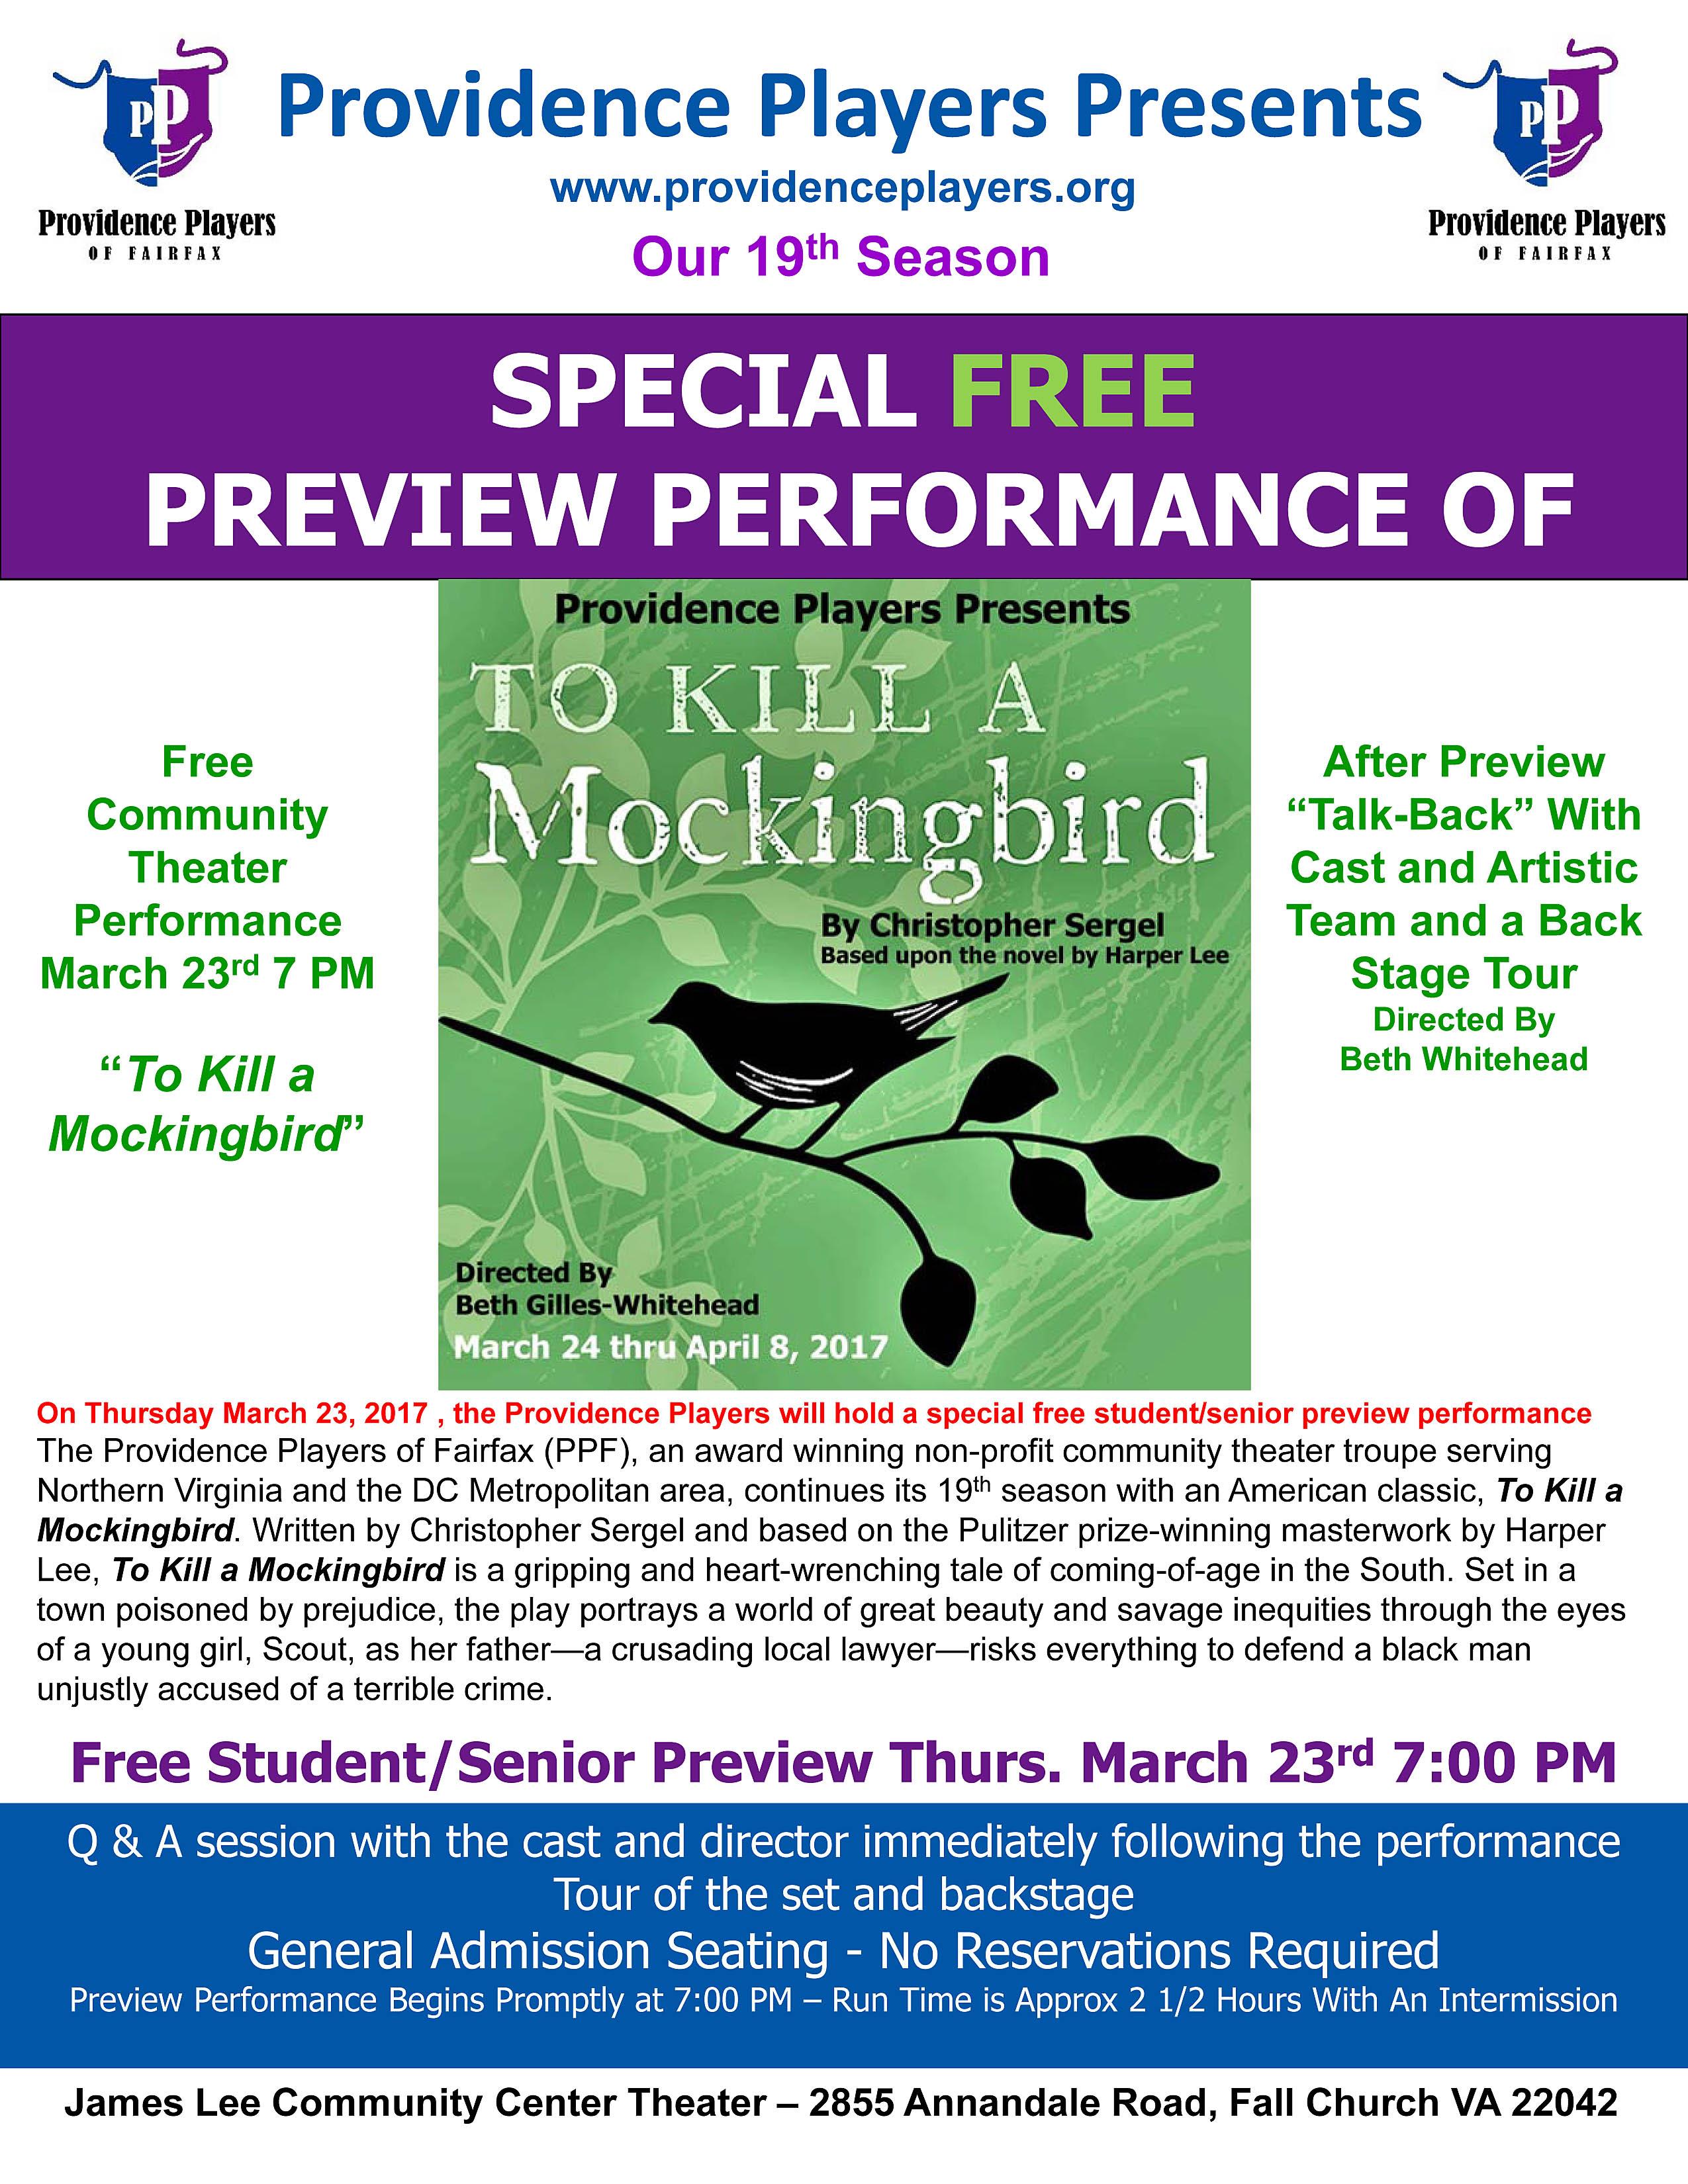 Microsoft PowerPoint - PPF To Kill a Mockingbird Free Preview Pe